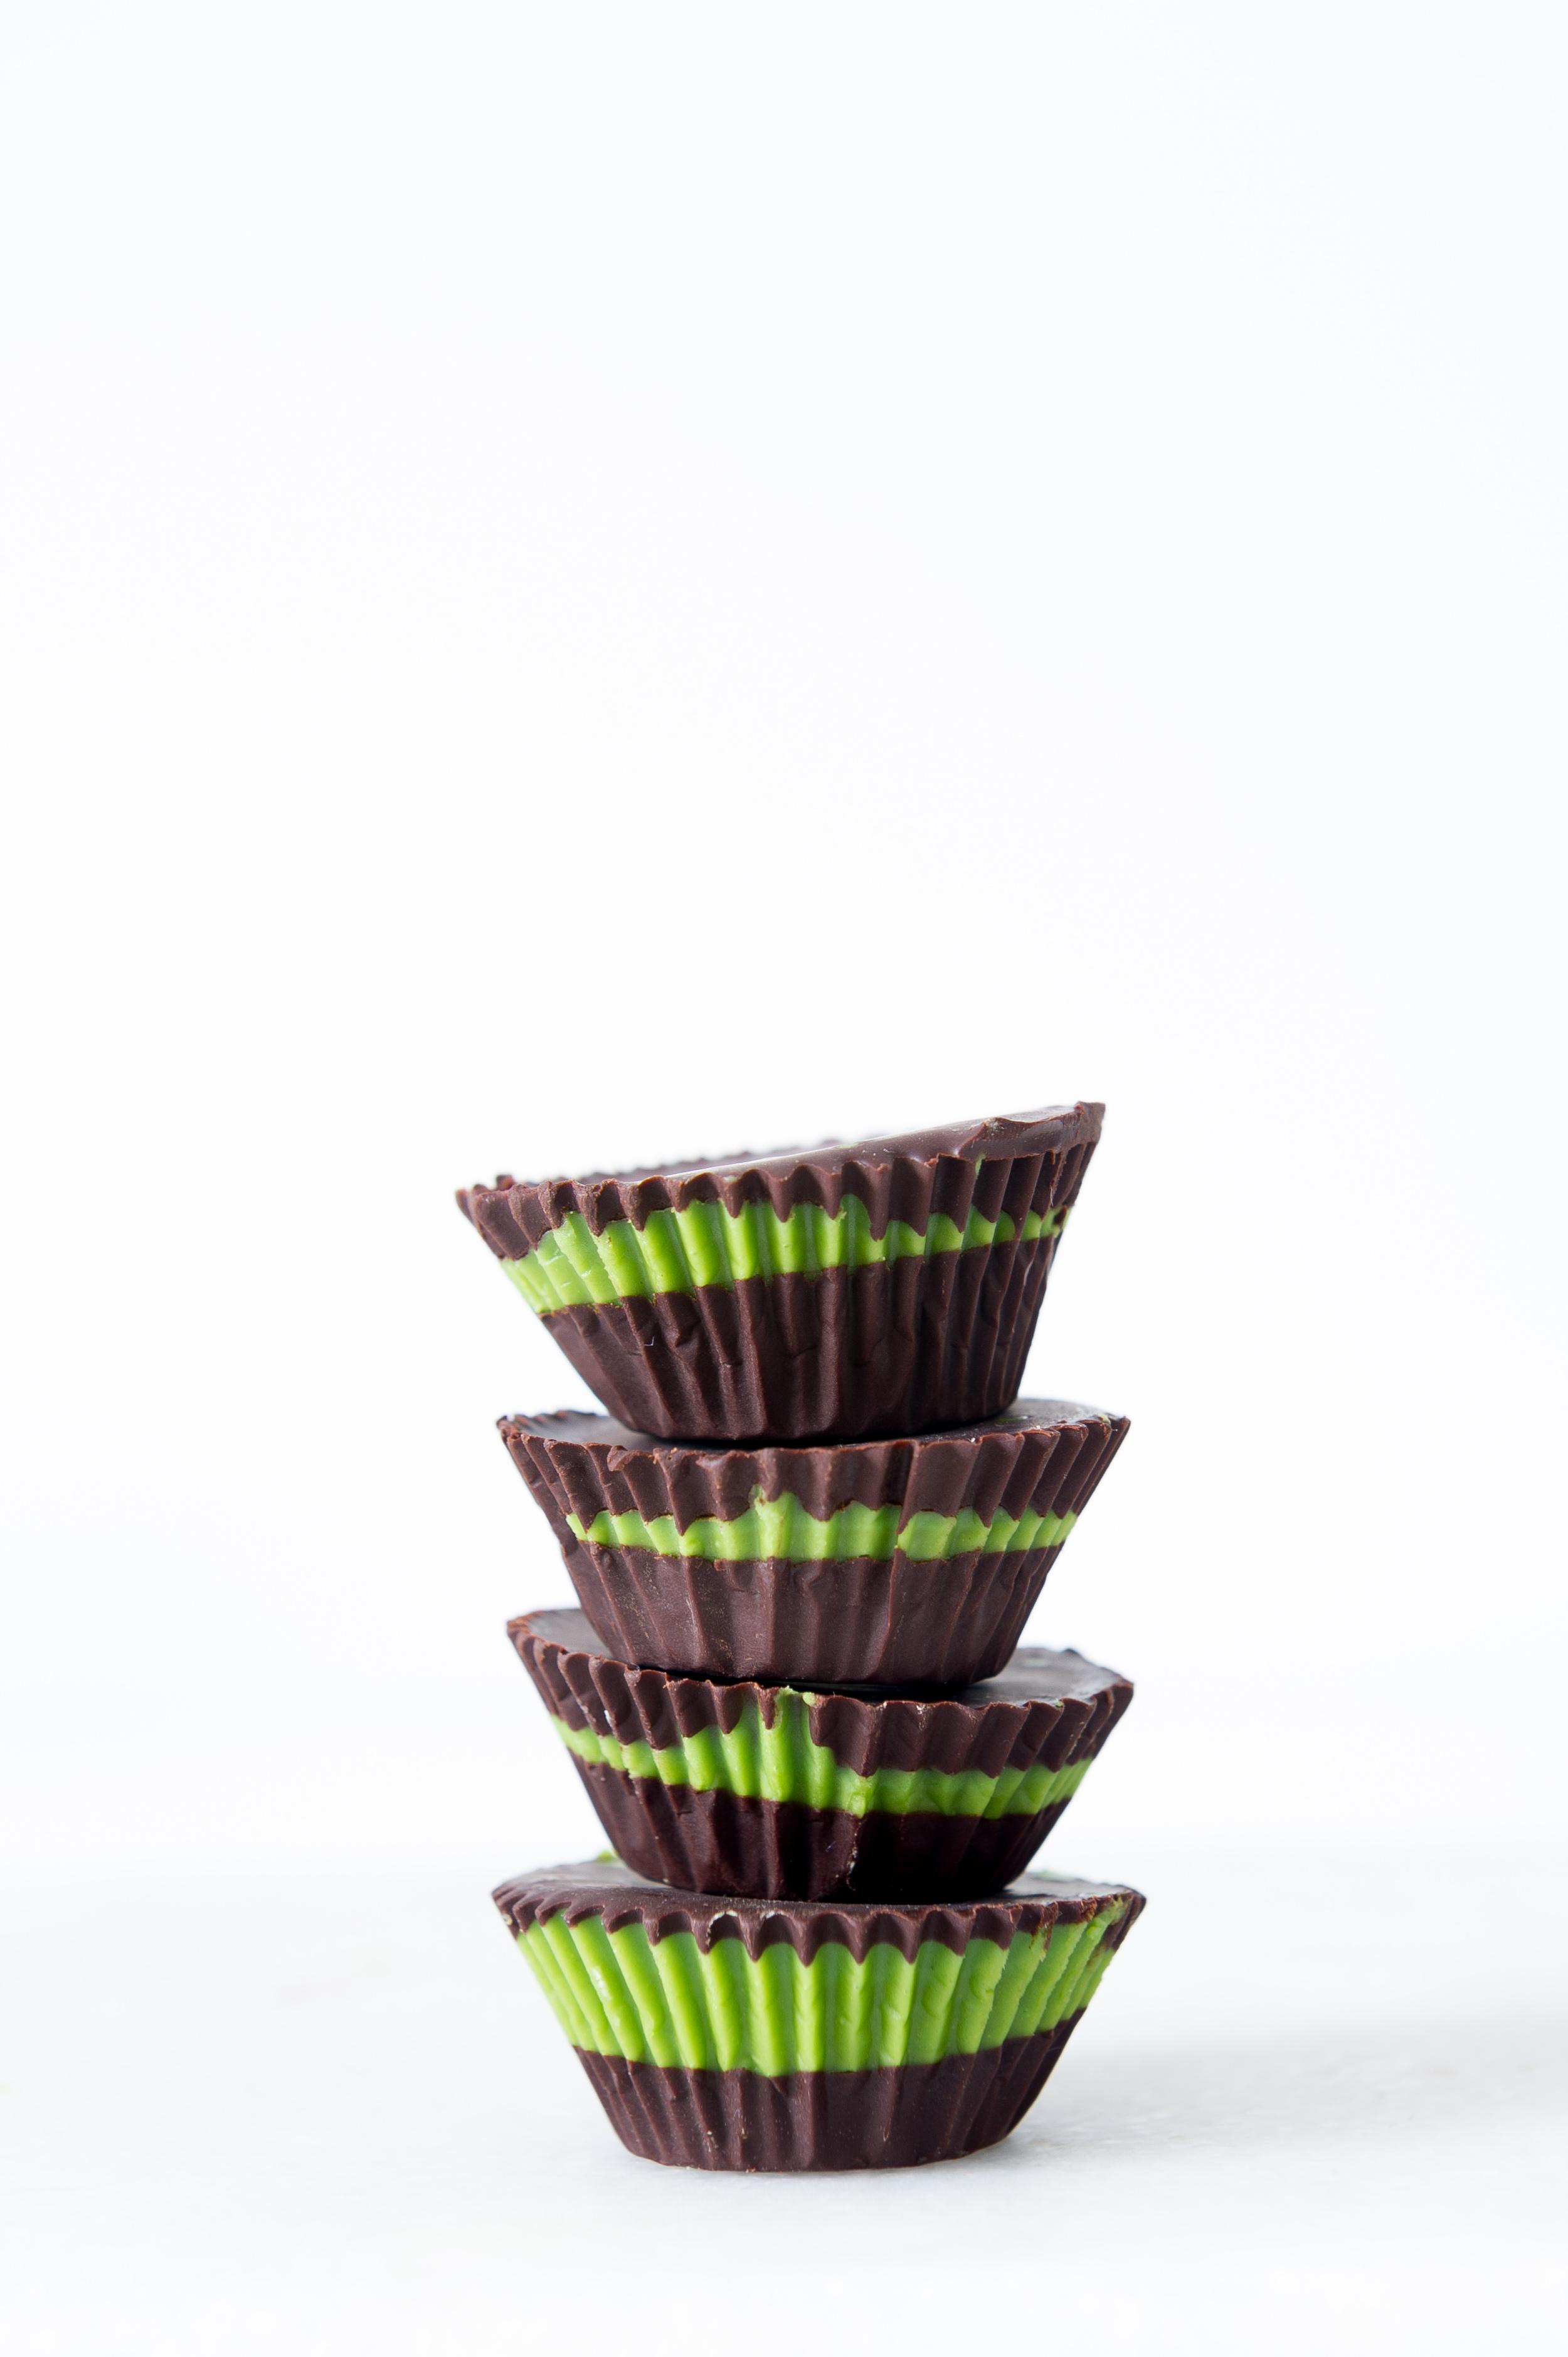 Chocolate Matcha Cups.Gluten free, Dairy free, Vegan.